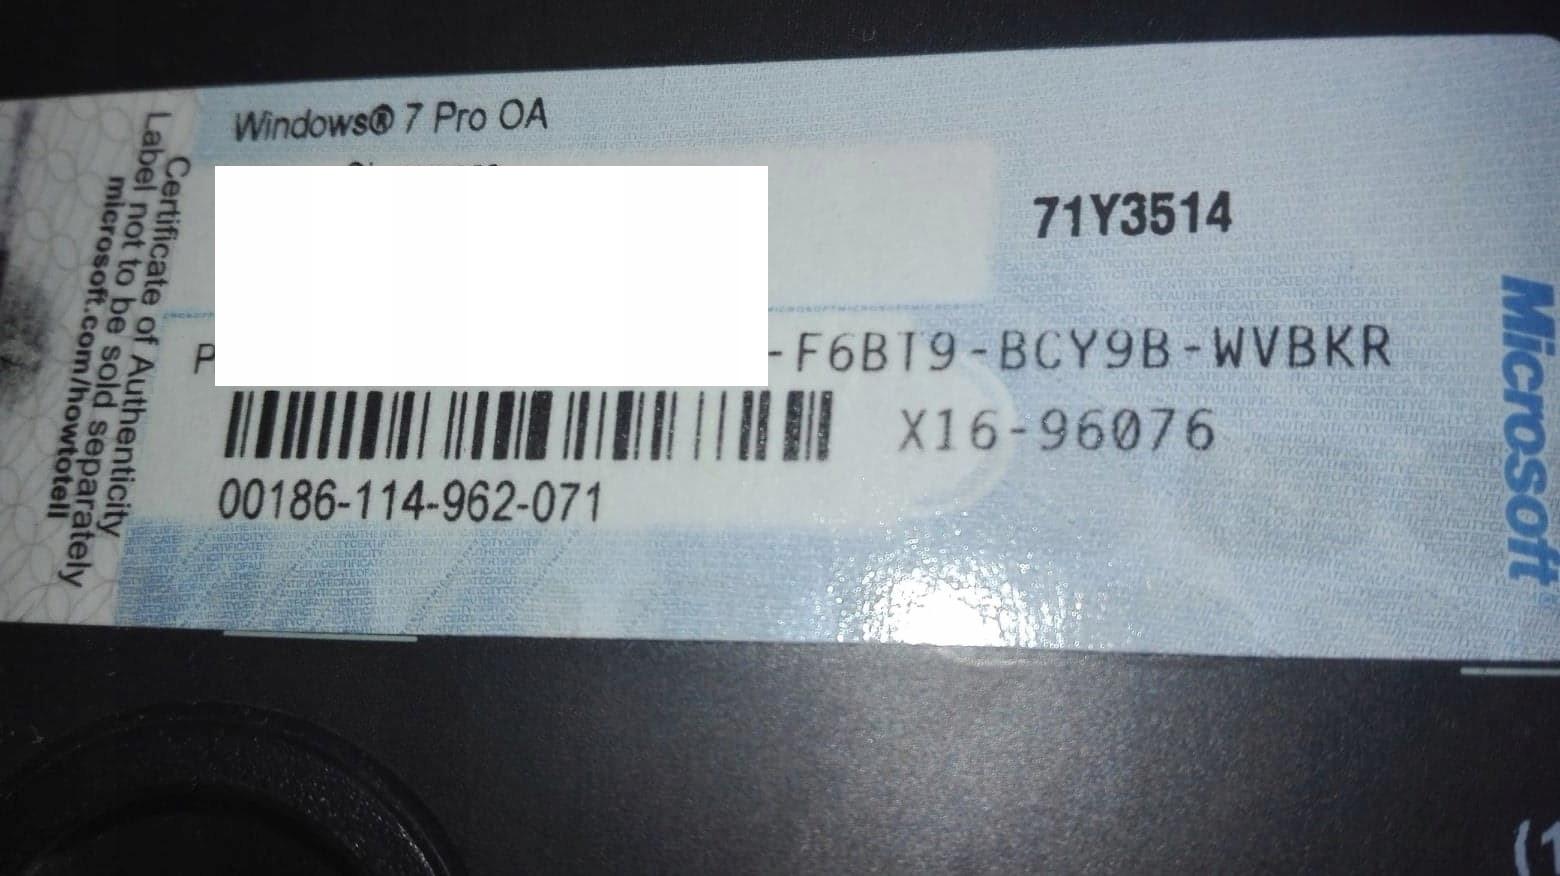 NAKLEJKA COA WIN7 Pro do HP ORGINAł mała 64bit